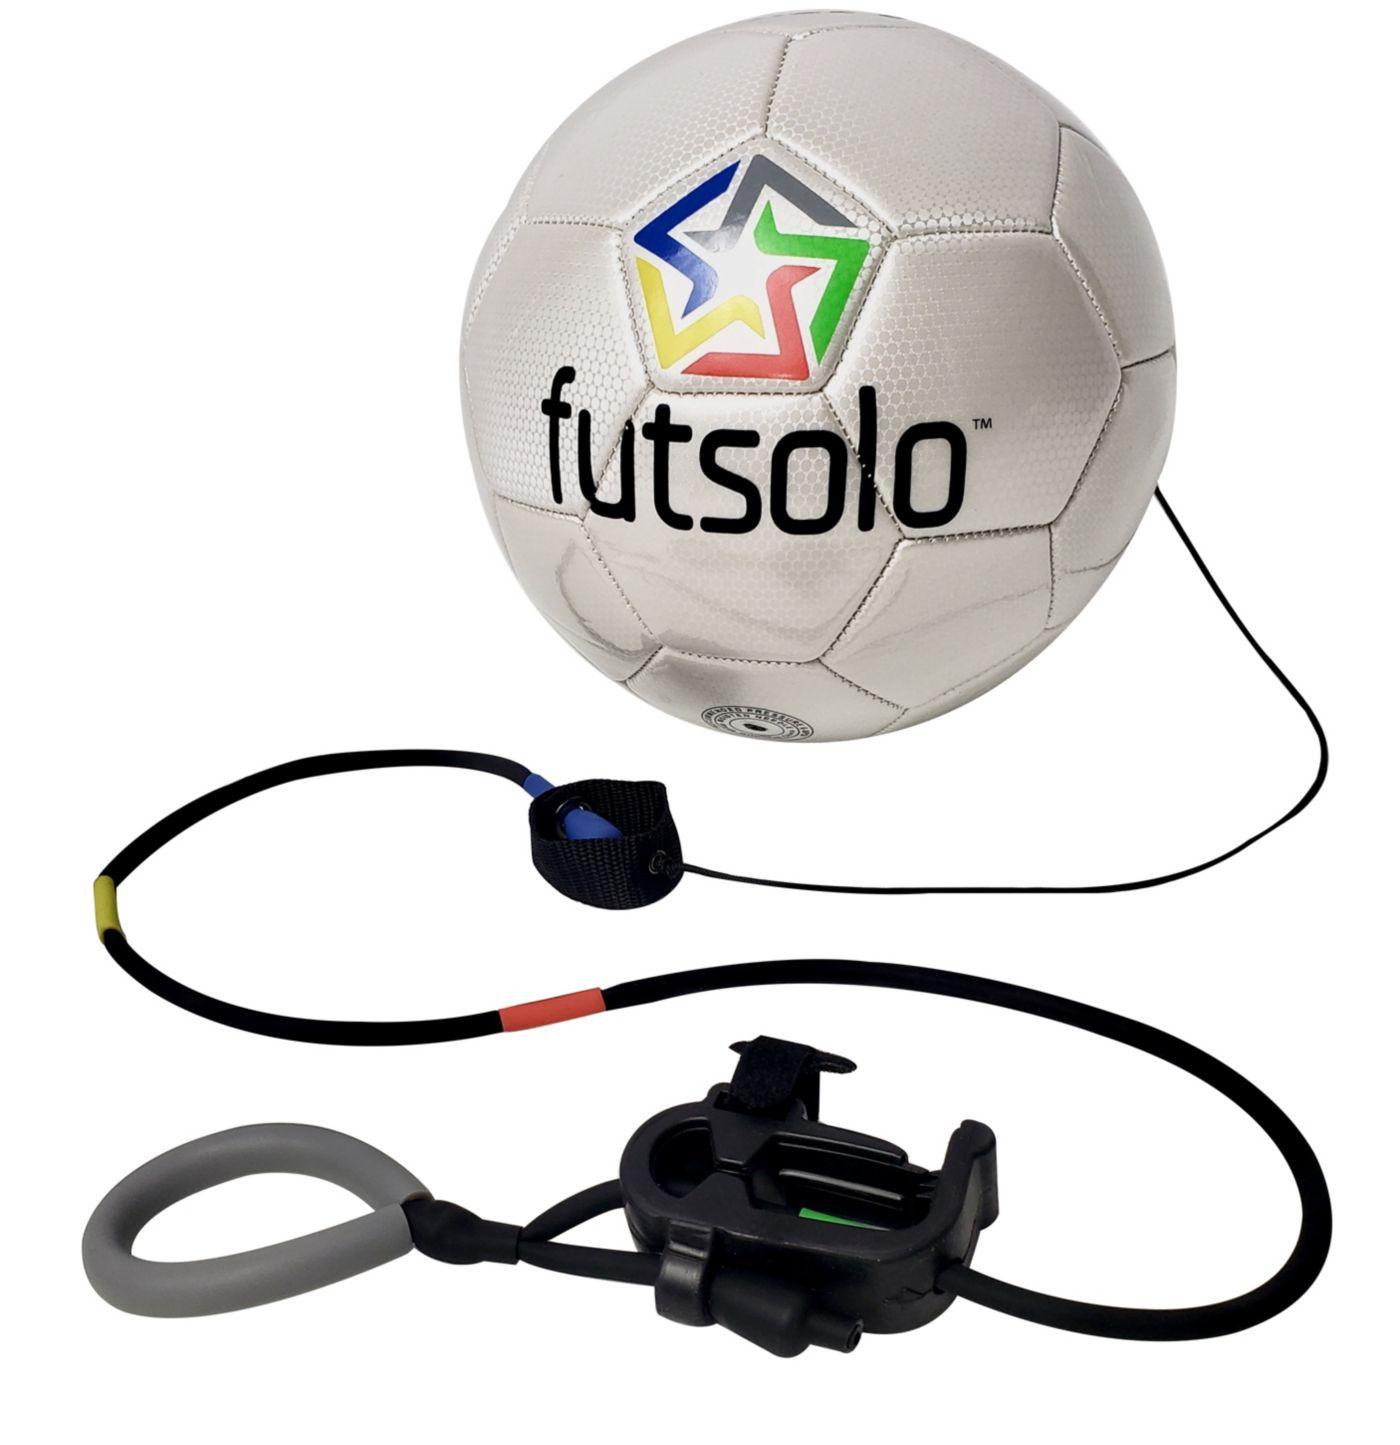 Futsolo Kick Trainer Ball and Adjustable 'Real Return' Cord